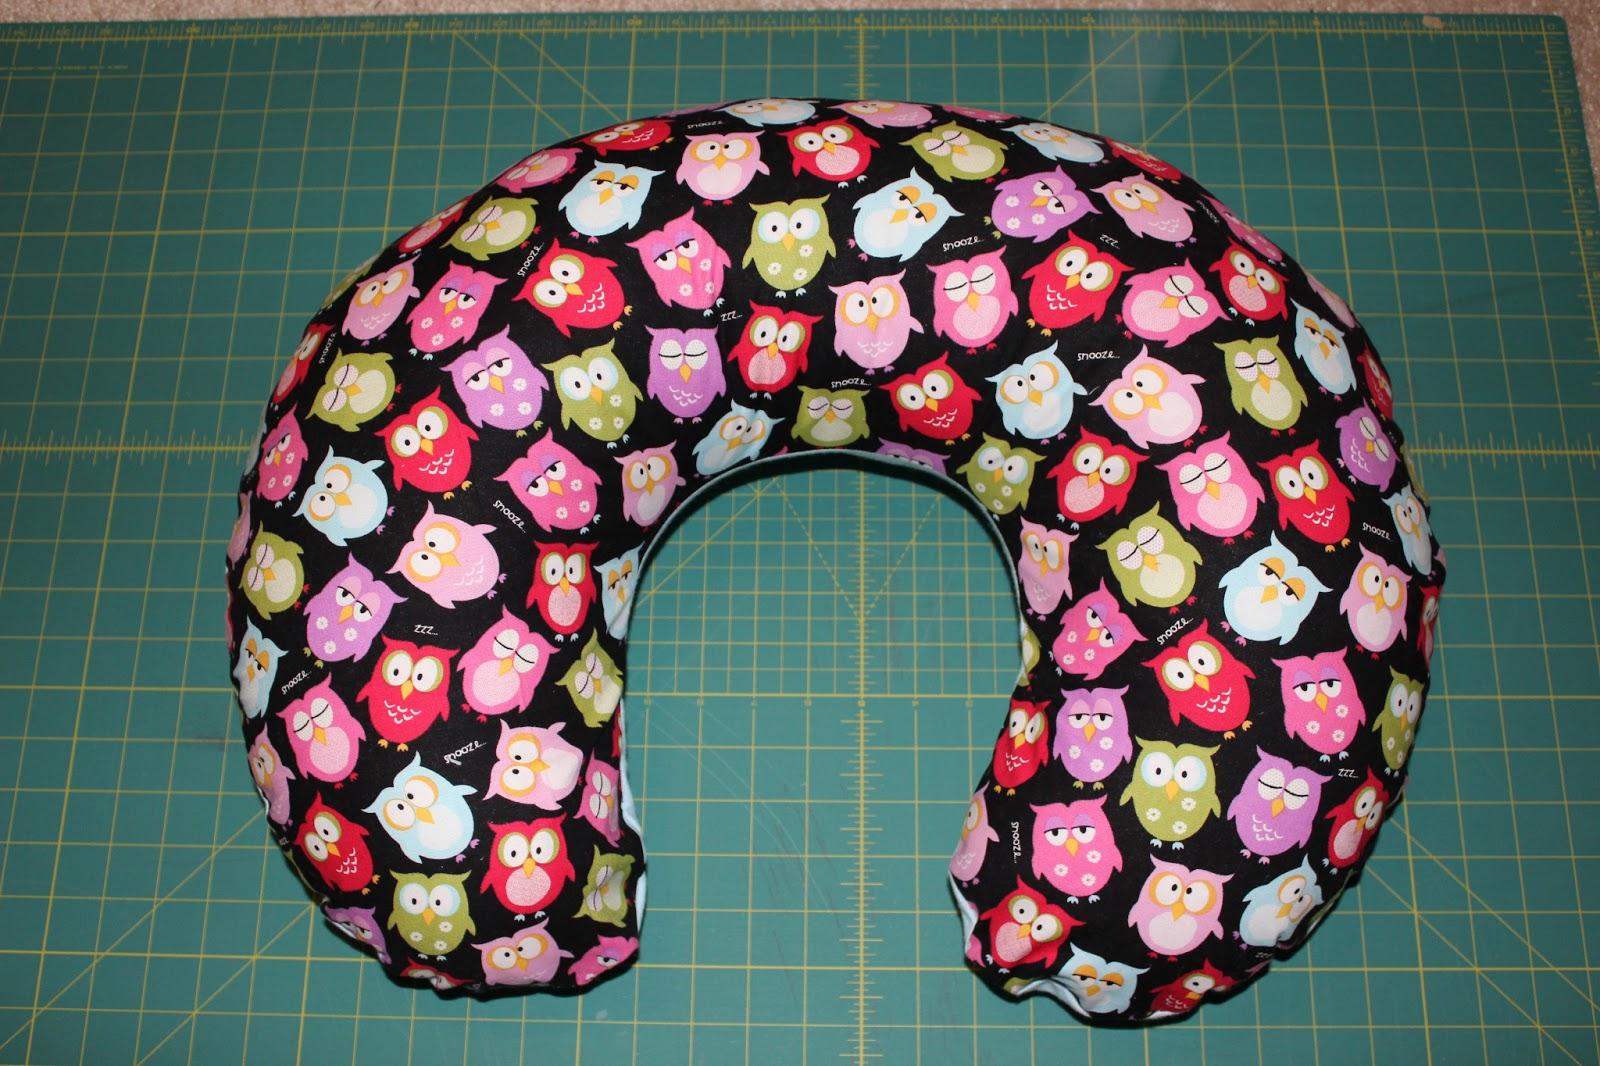 Boppy Pillow Cover & Little Blip: Boppy Pillow Cover pillowsntoast.com